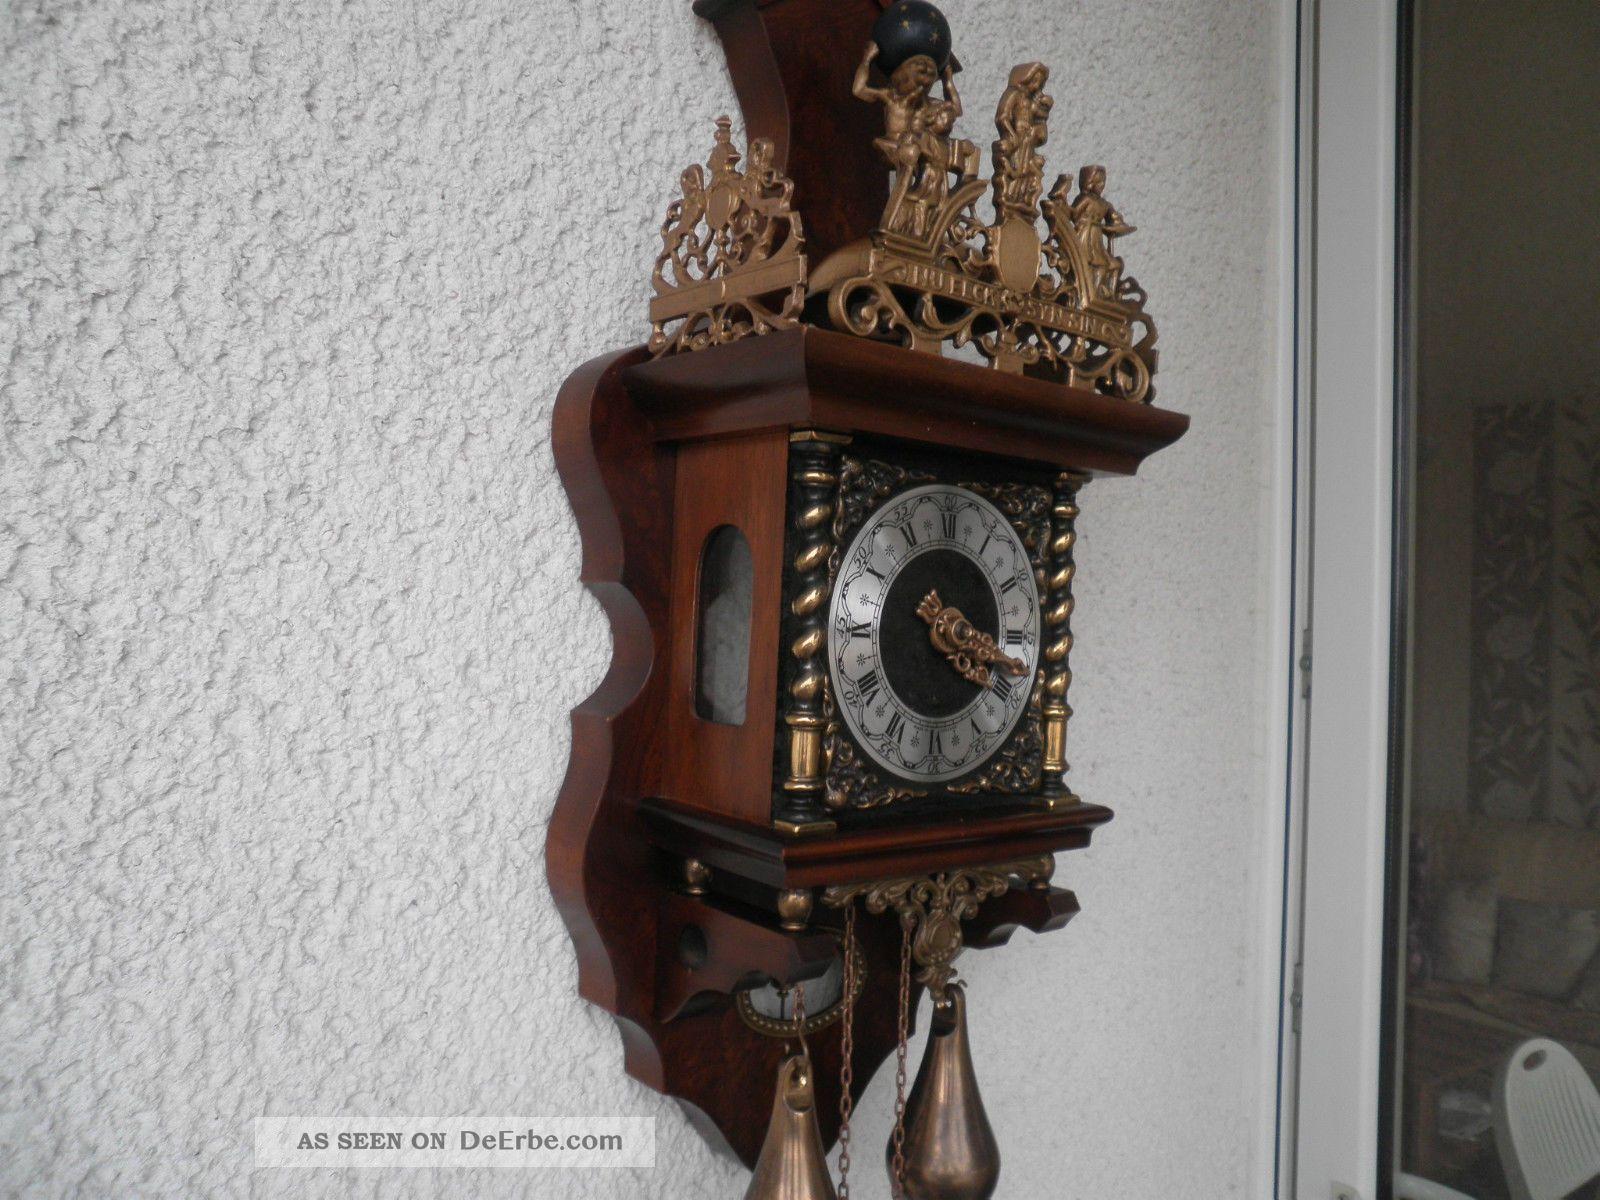 holz regulator wanduhr aus holland glockenschlag zaanse clock innen 60cm. Black Bedroom Furniture Sets. Home Design Ideas